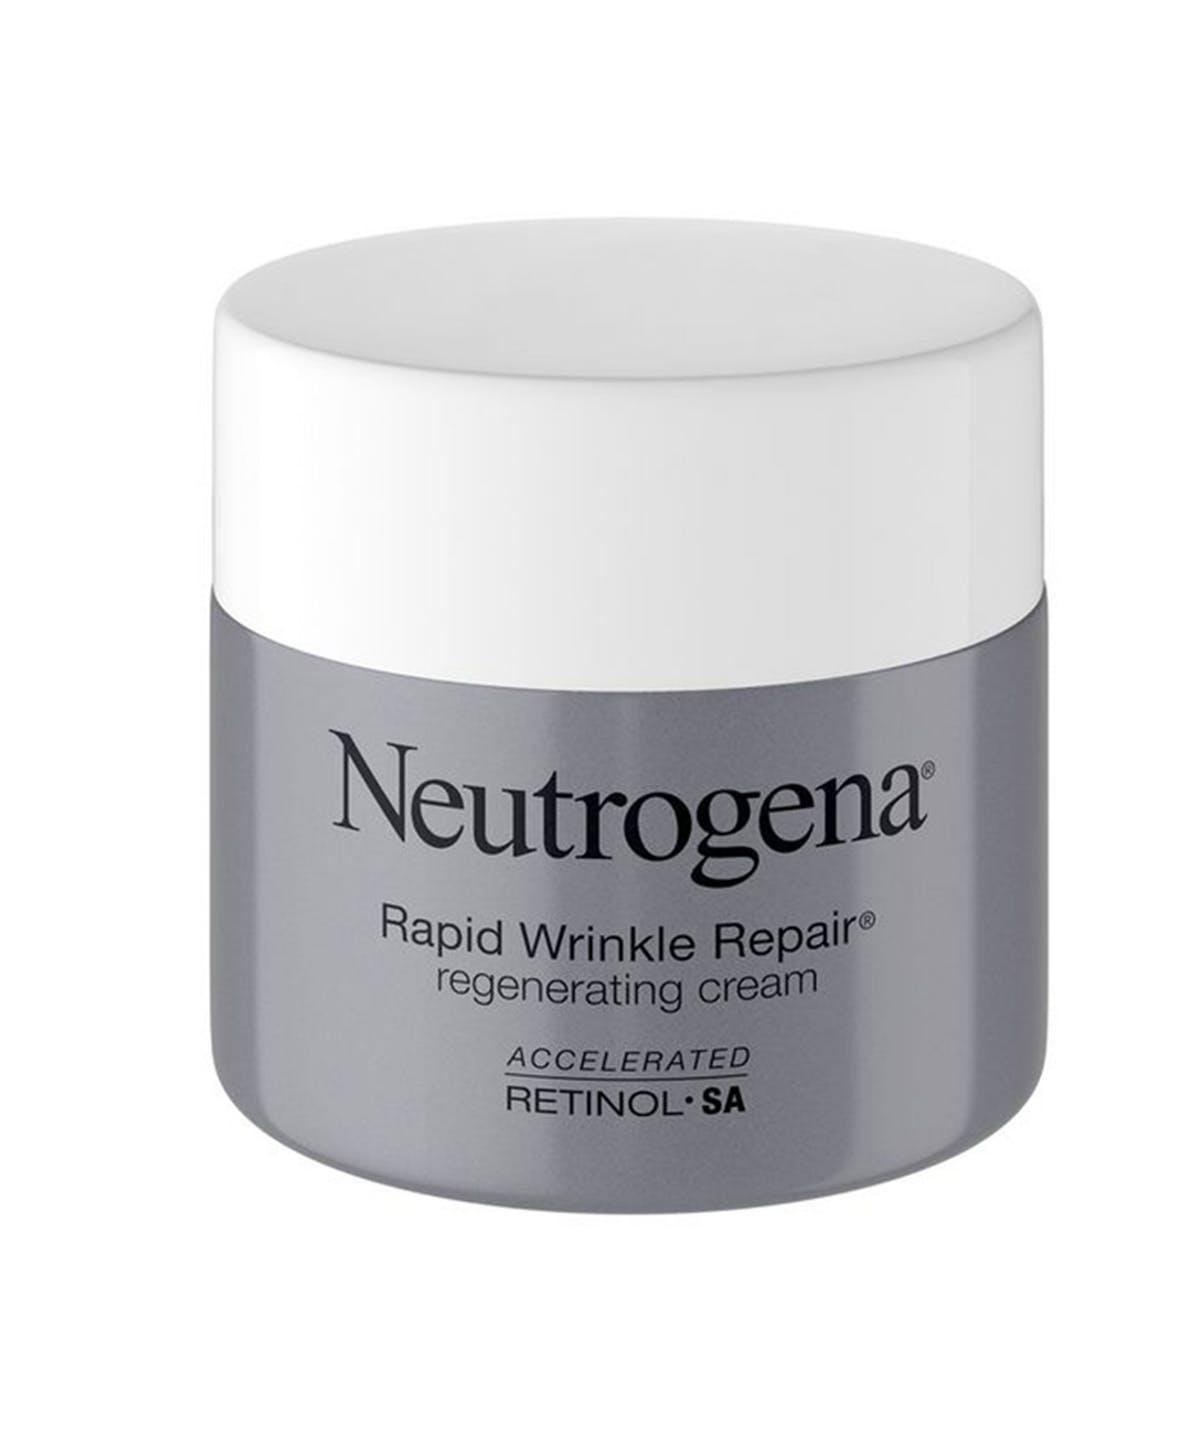 neutrogena rapid wrinkle repair retinol cream